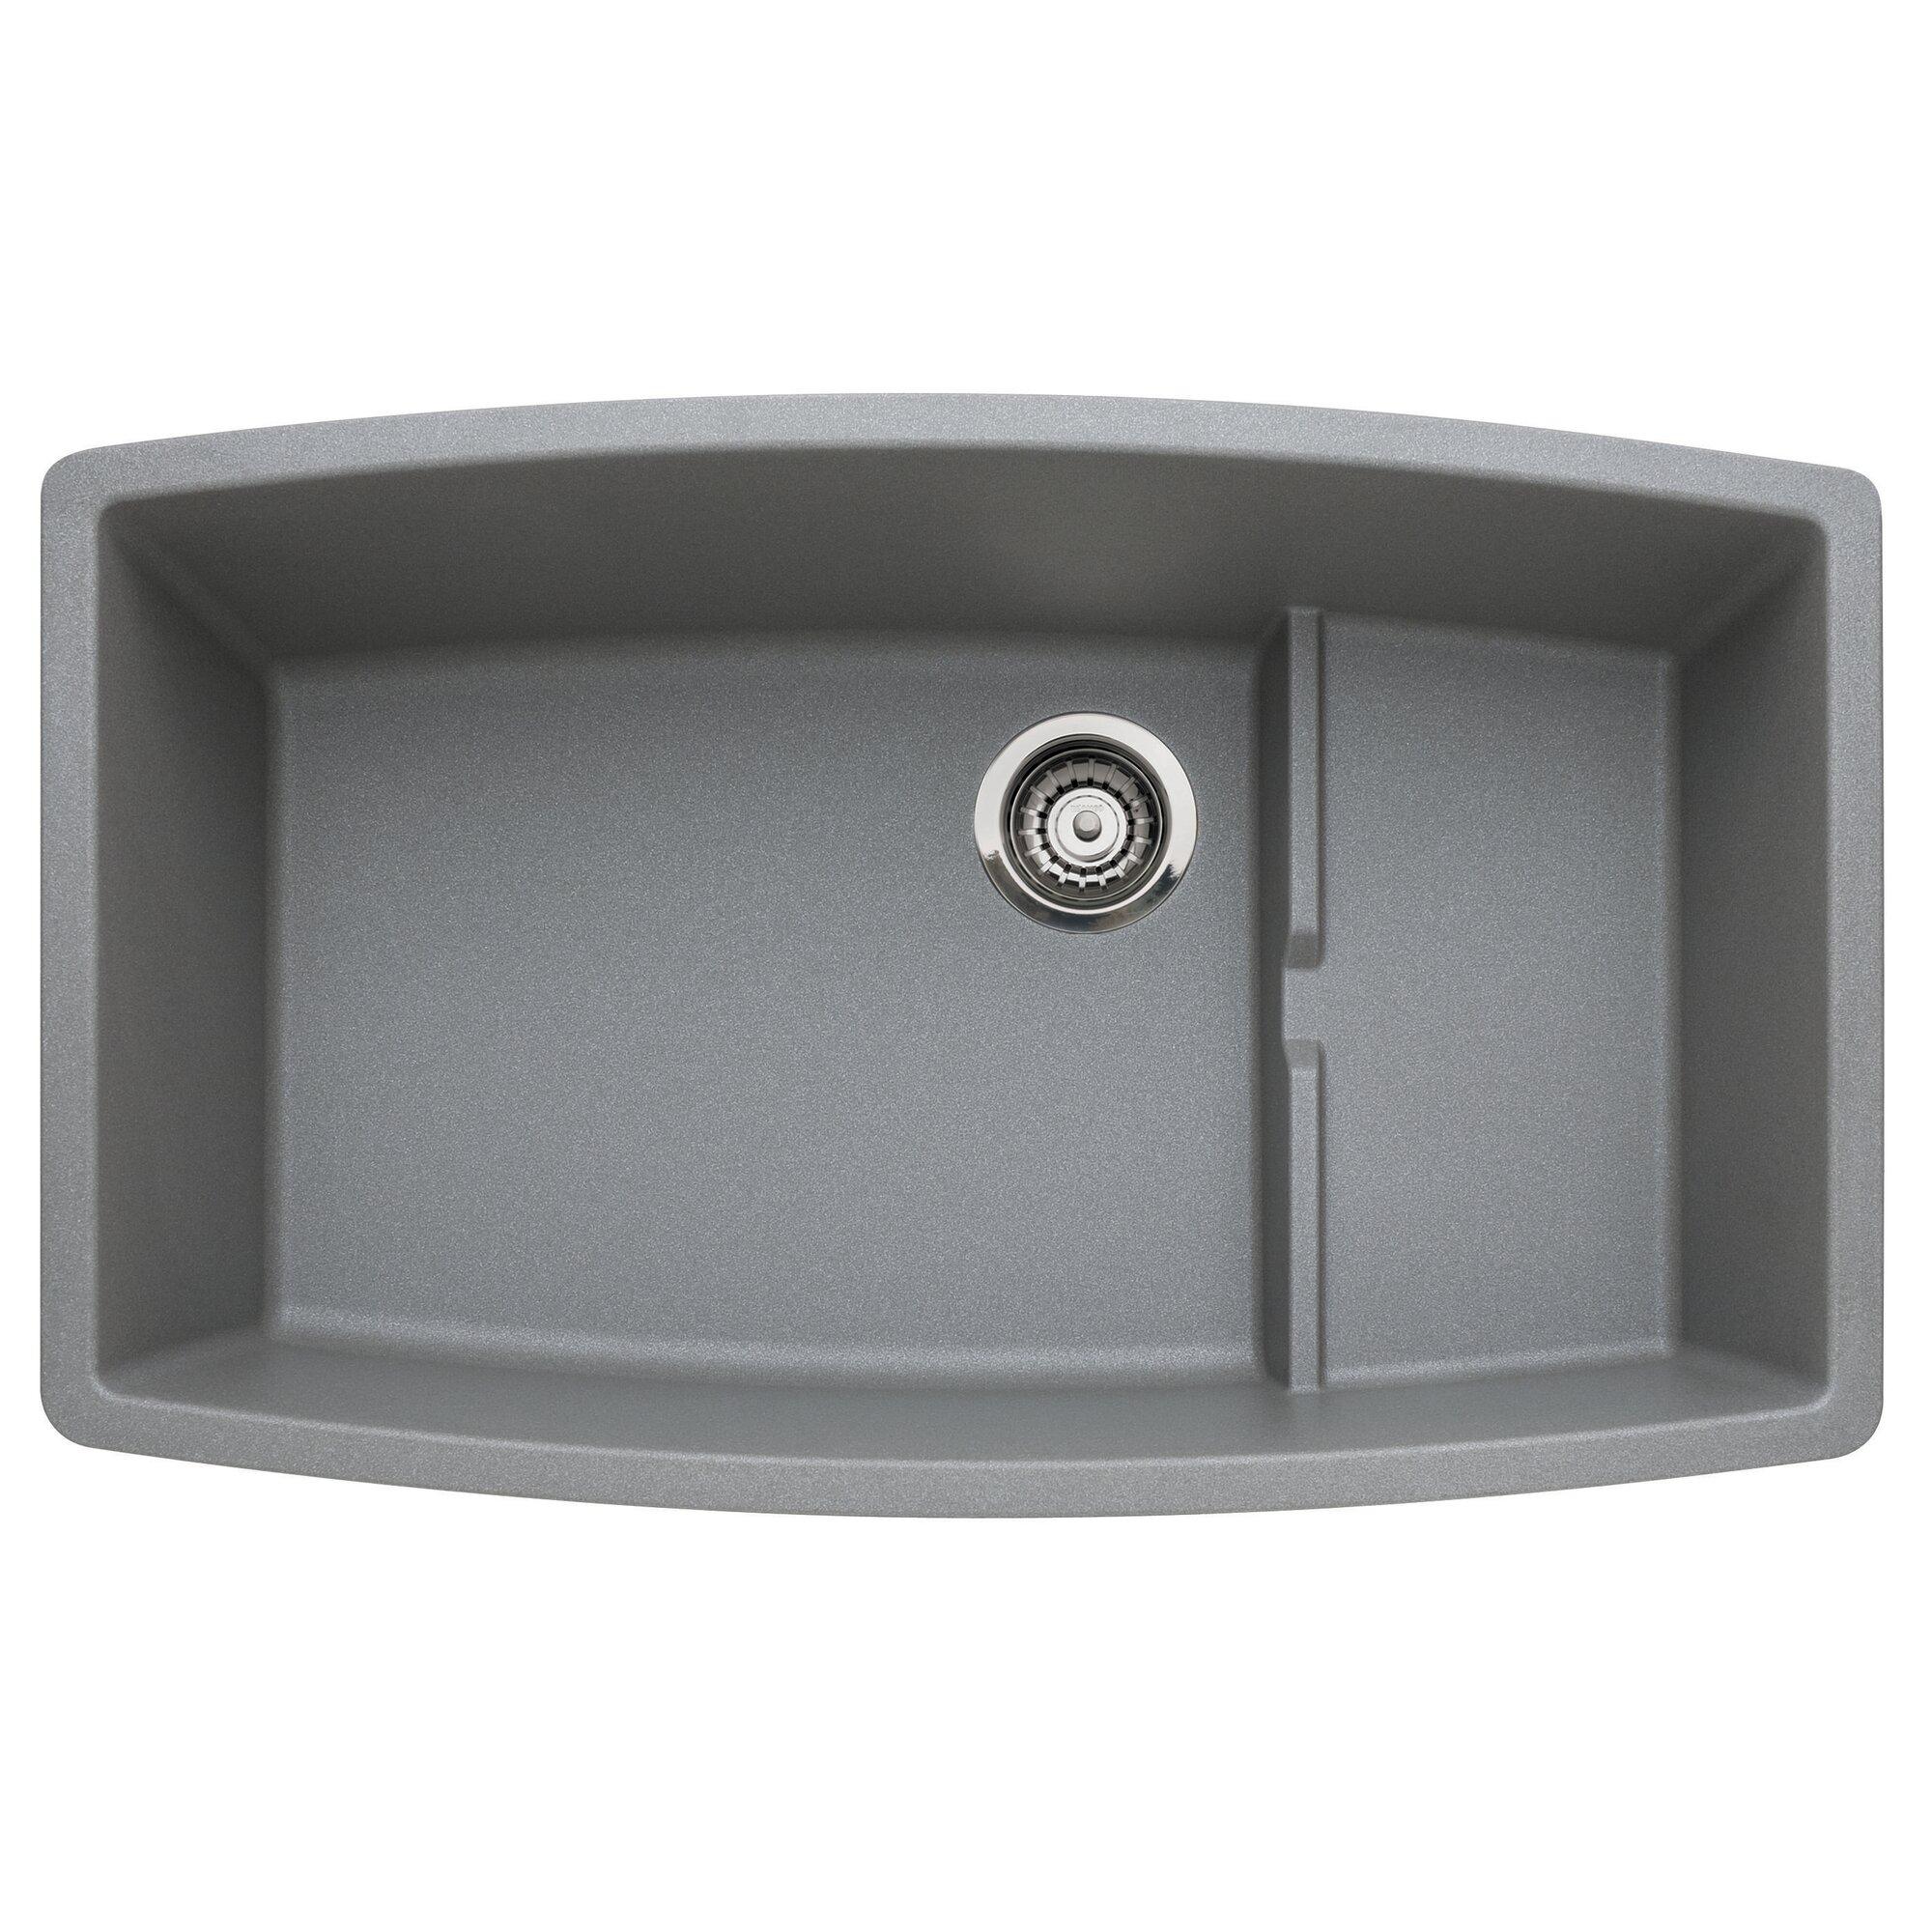 Blanco Precision Sink